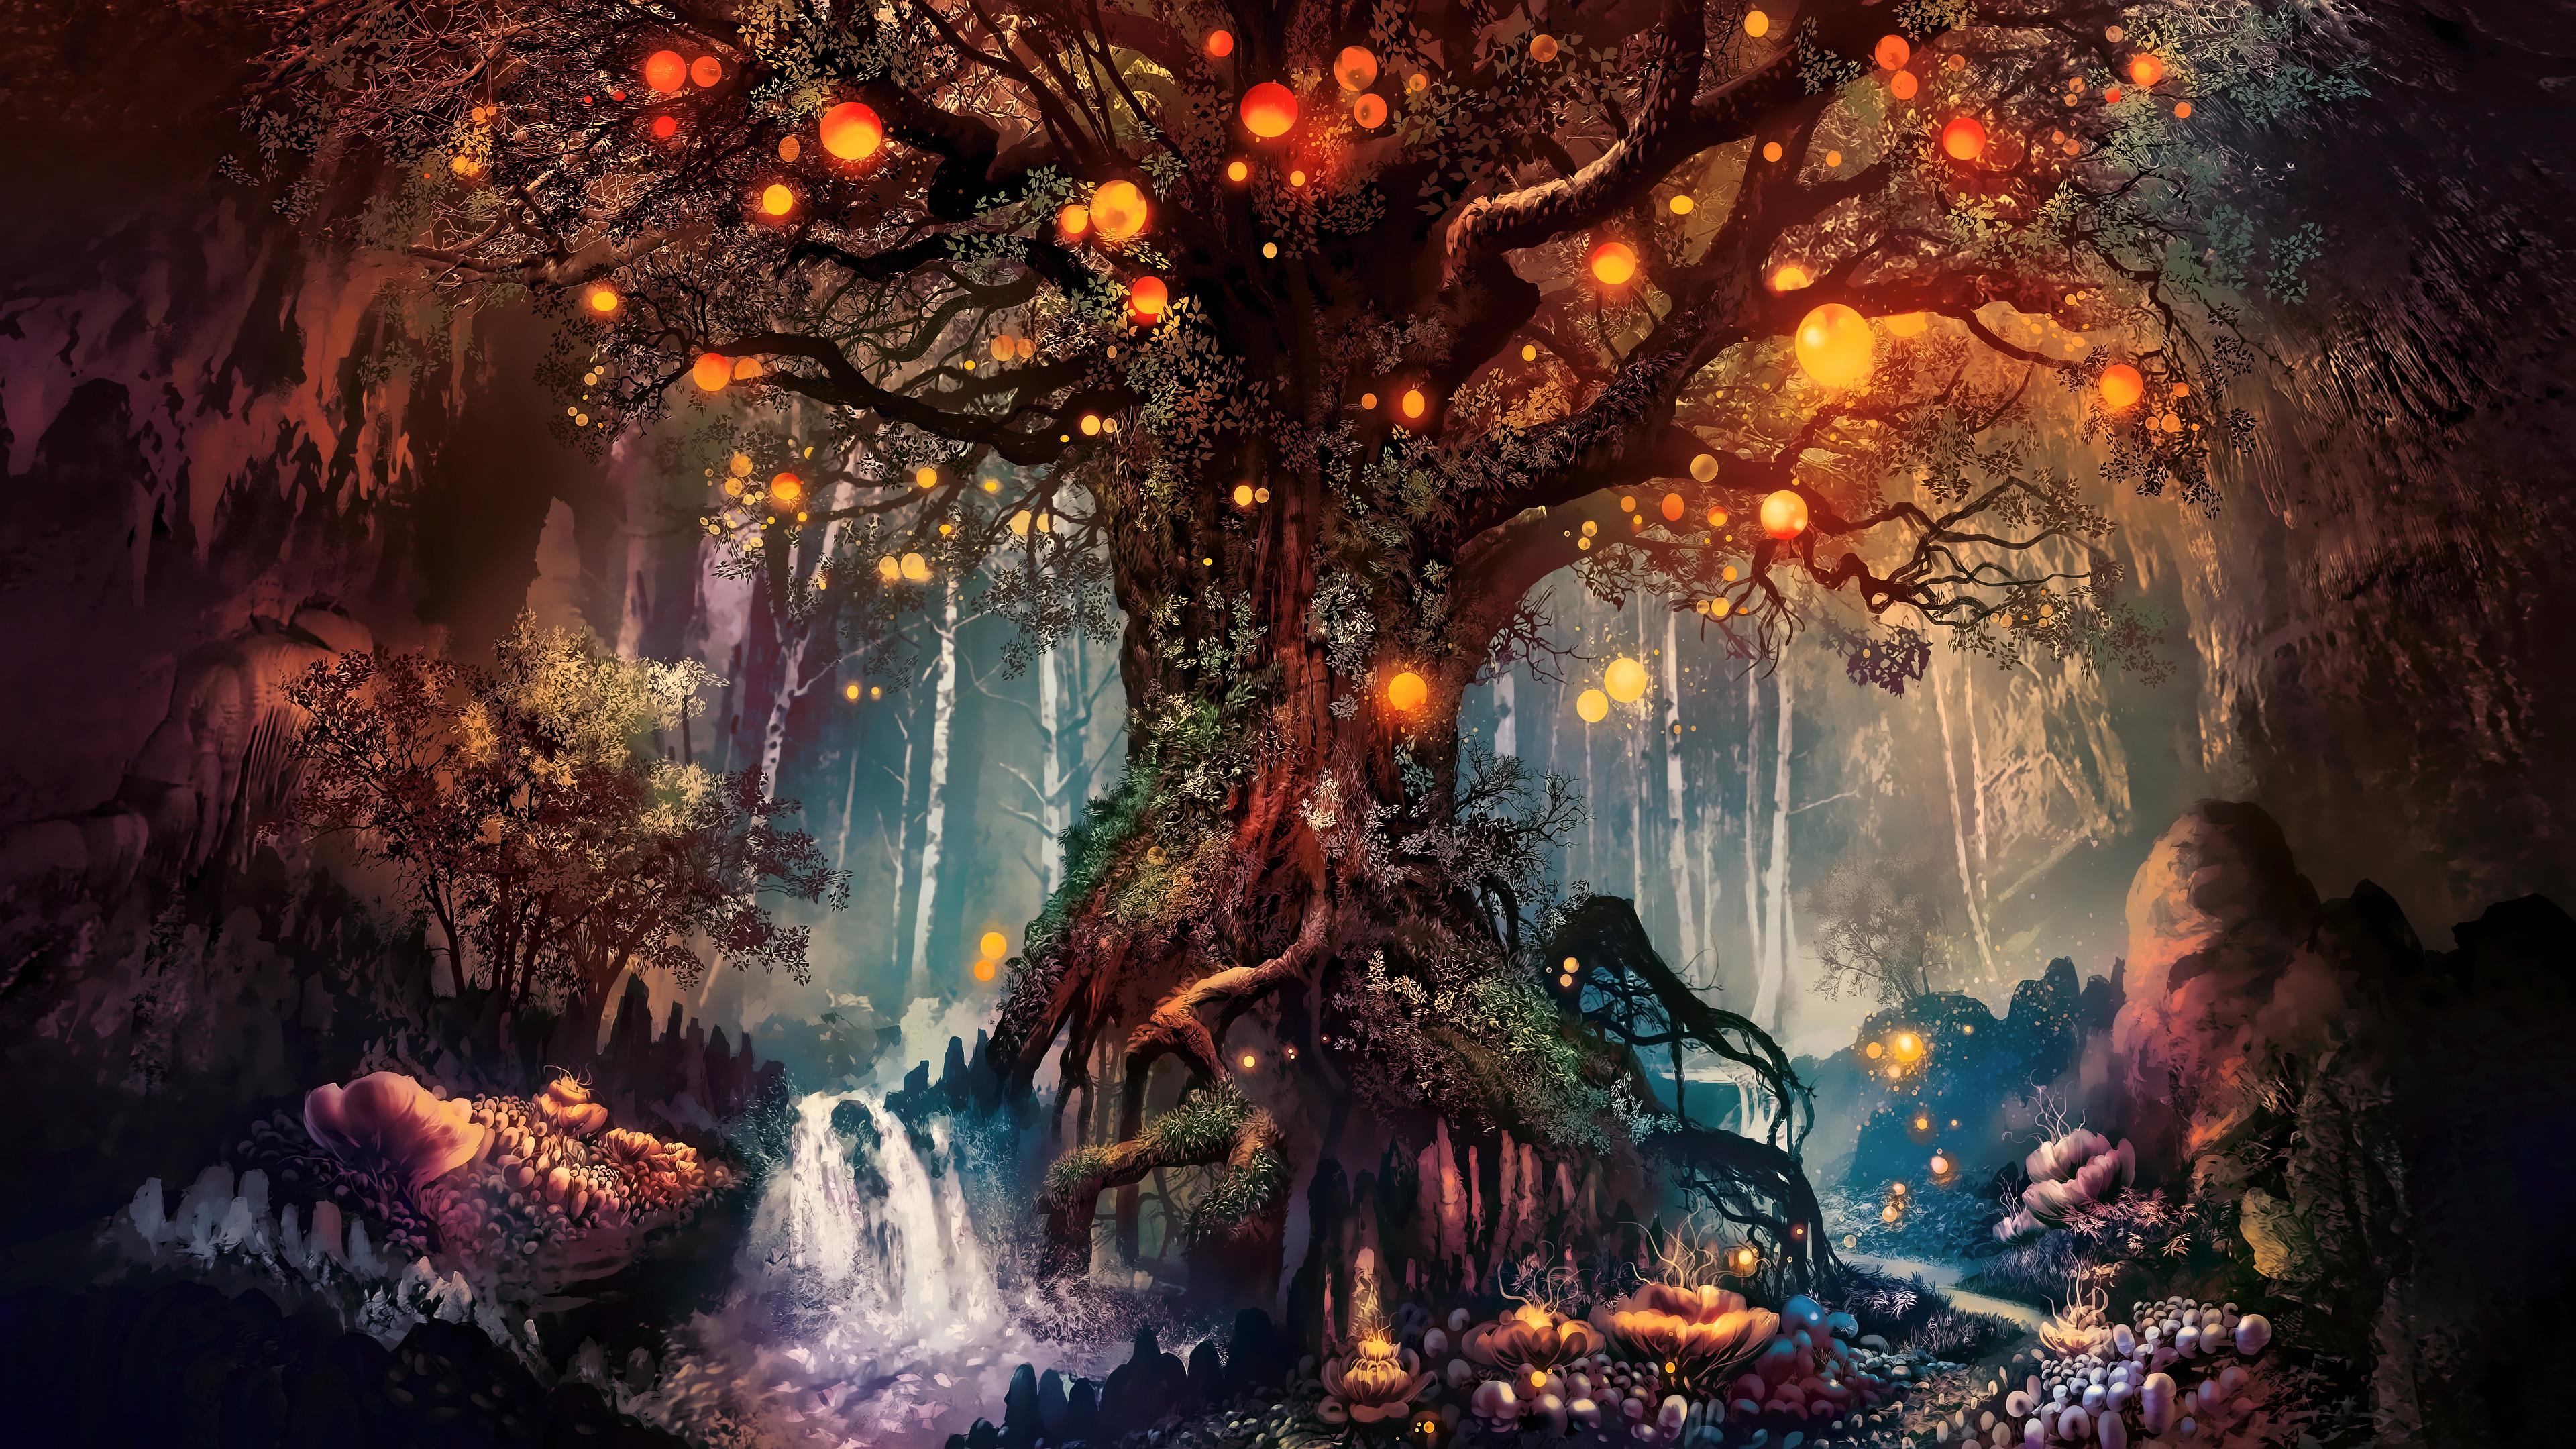 2880x1800 Forest Fantasy Artwork 4k Macbook Pro Retina HD